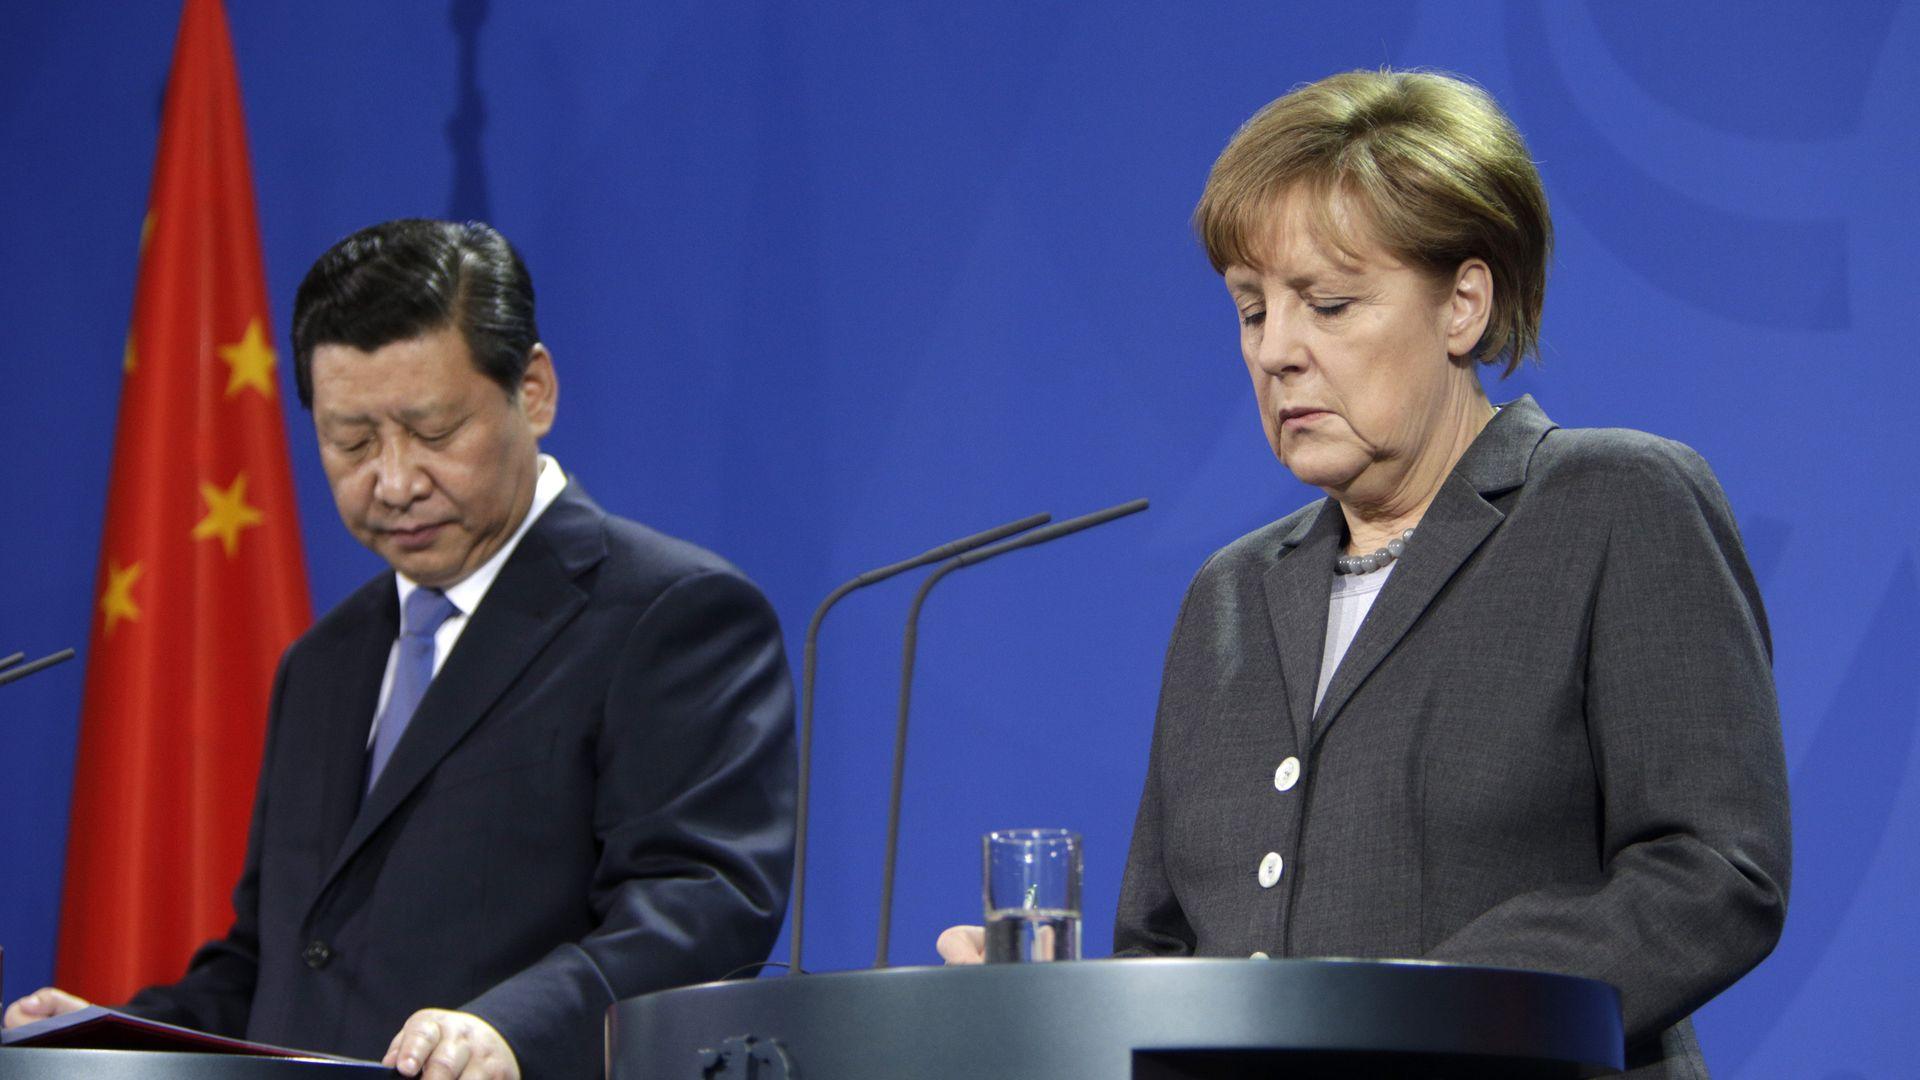 Xi and Merkel both look down